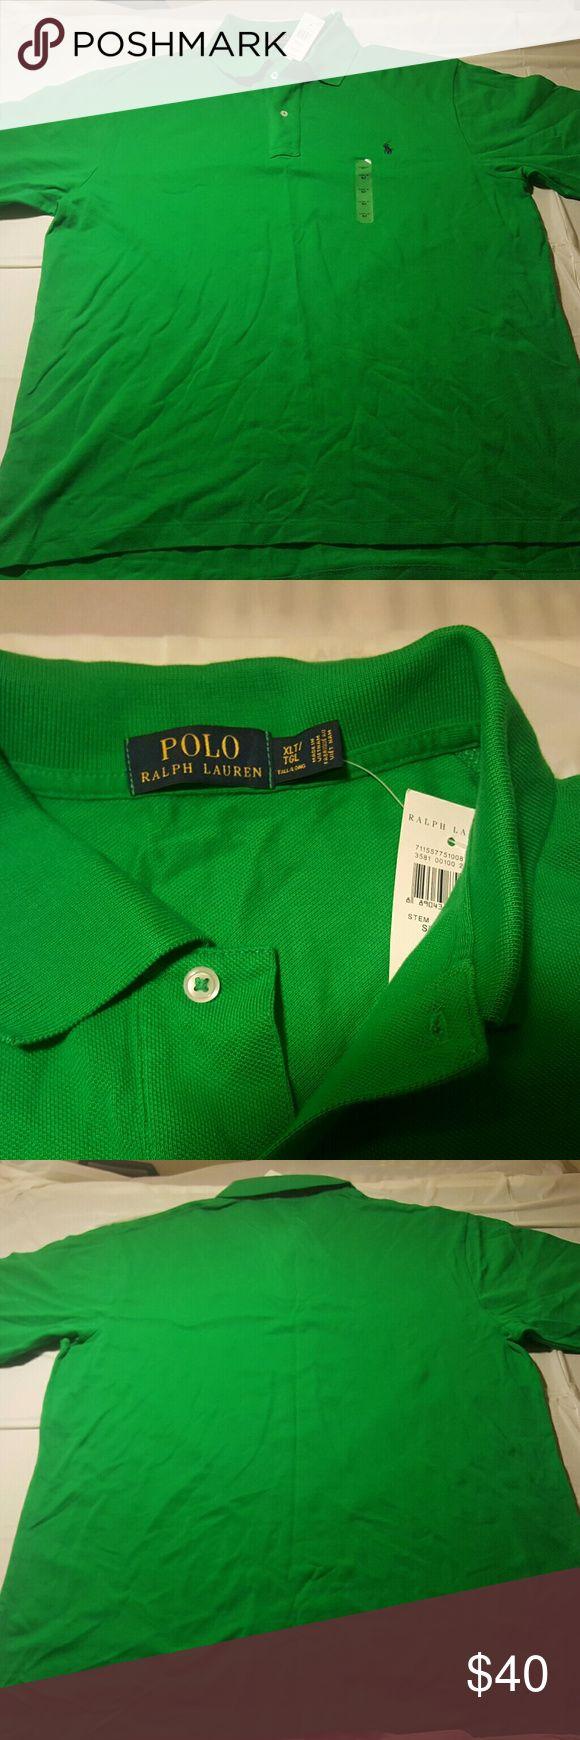 Polo Ralph Lauren mens xlt bright green polo s/s New with tags Polo Ralph Lauren mens xlt bright green polo shirt. Short sleeve. Polo by Ralph Lauren Shirts Polos